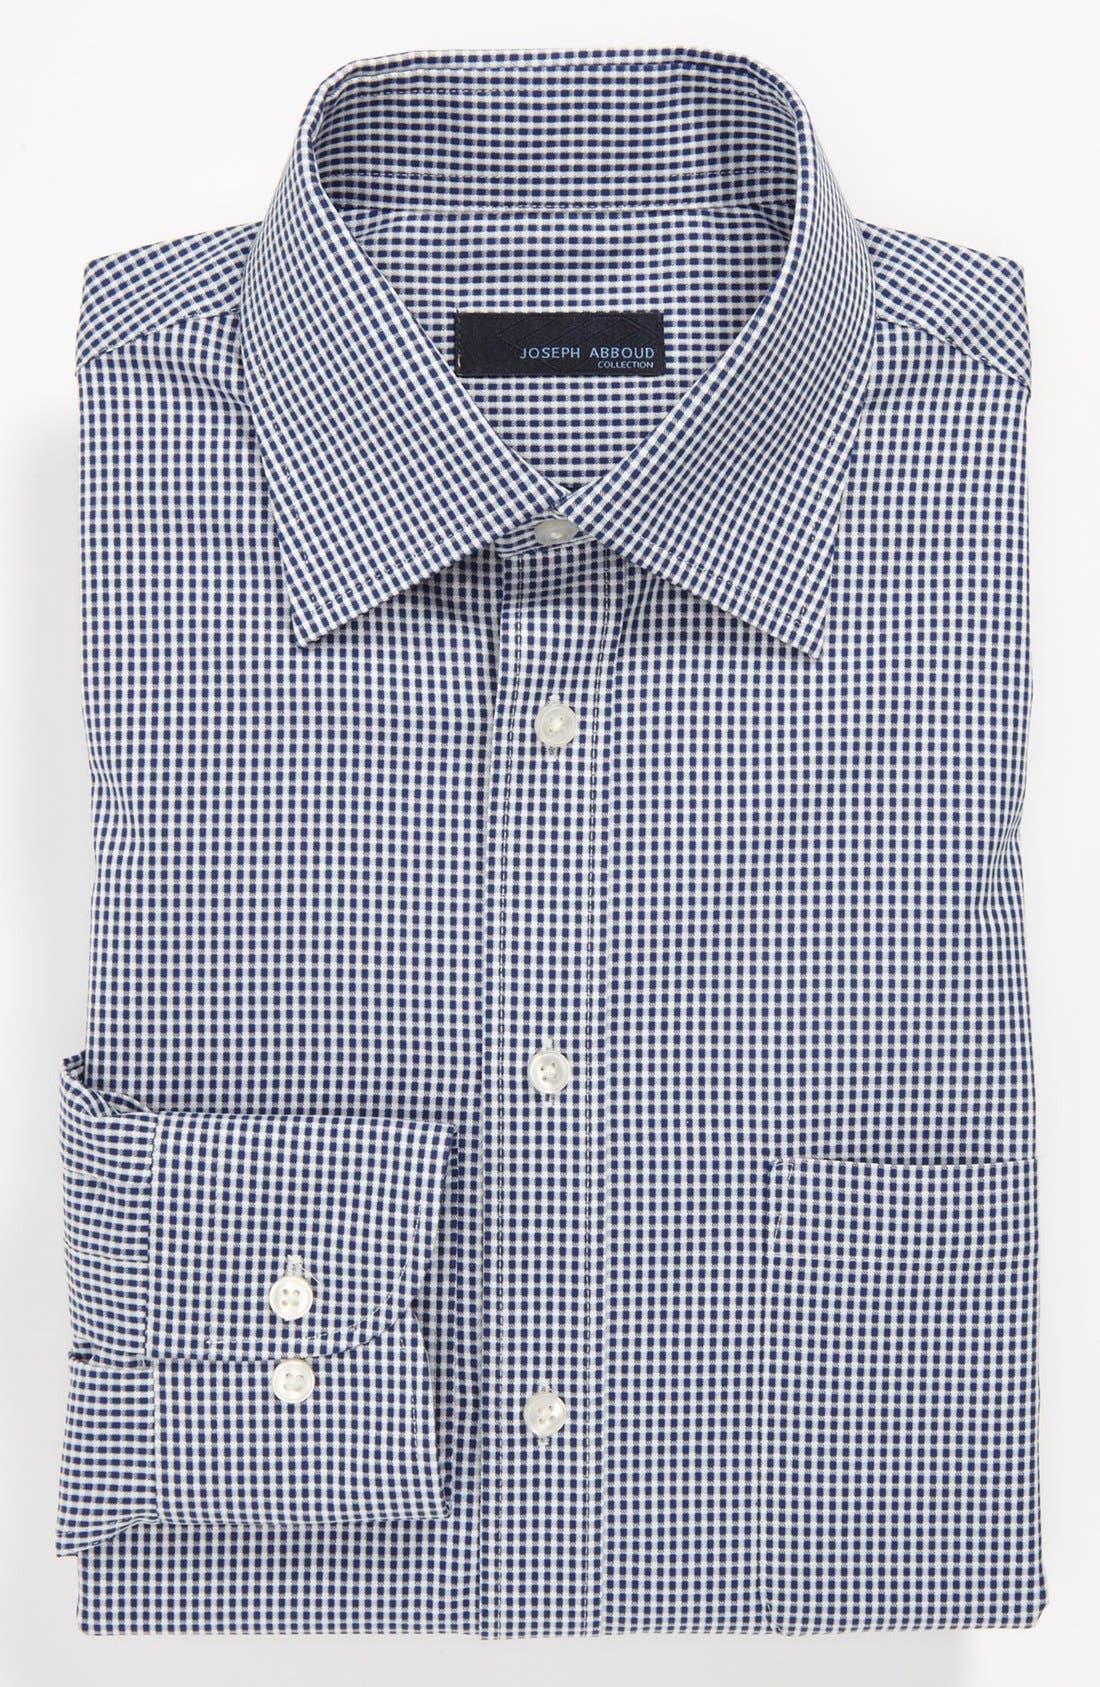 Main Image - Joseph Abboud Regular Fit Dress Shirt